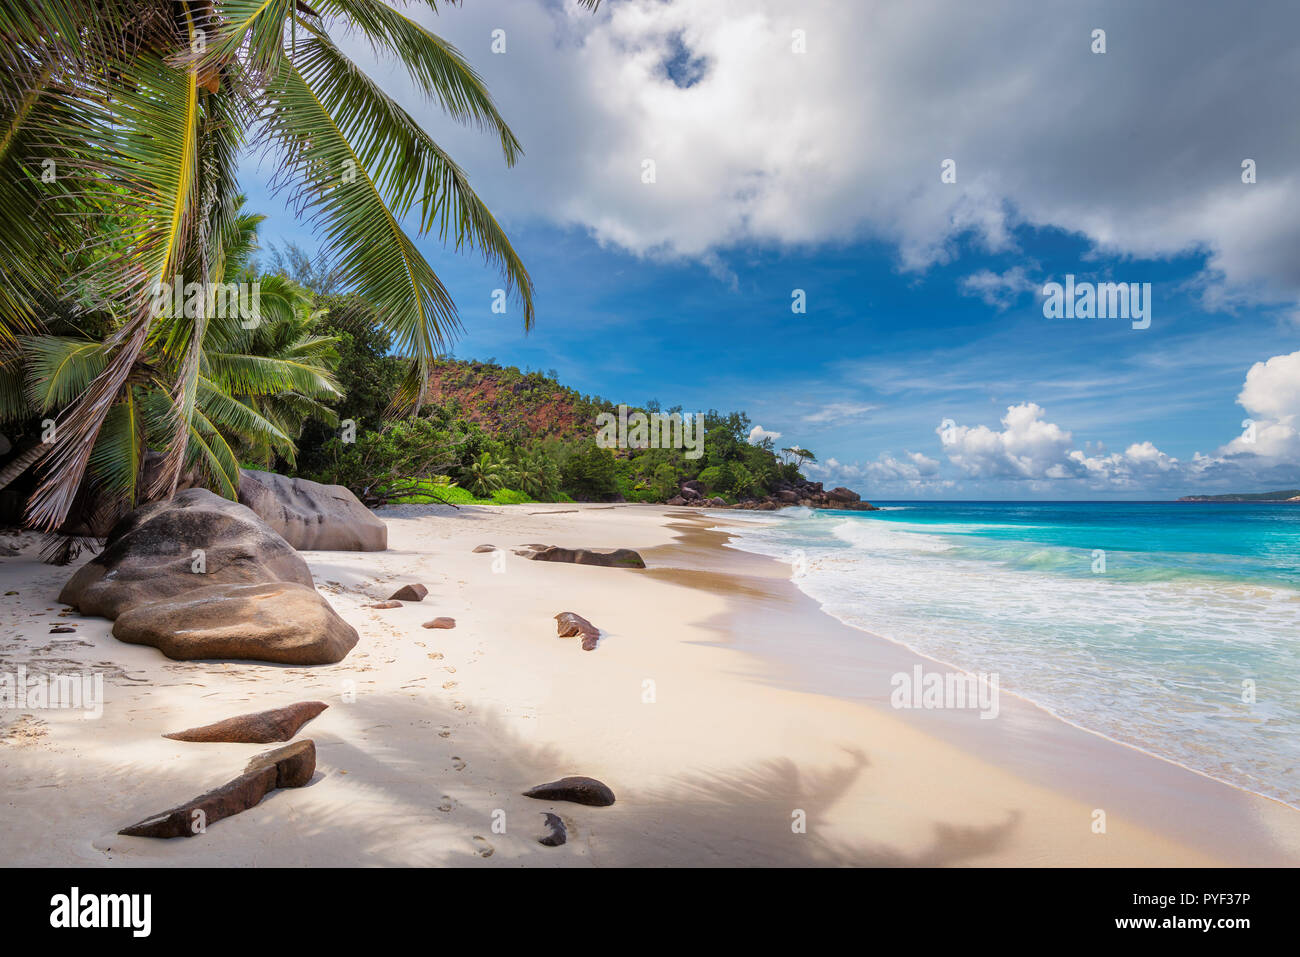 Seychelles beach - Stock Image